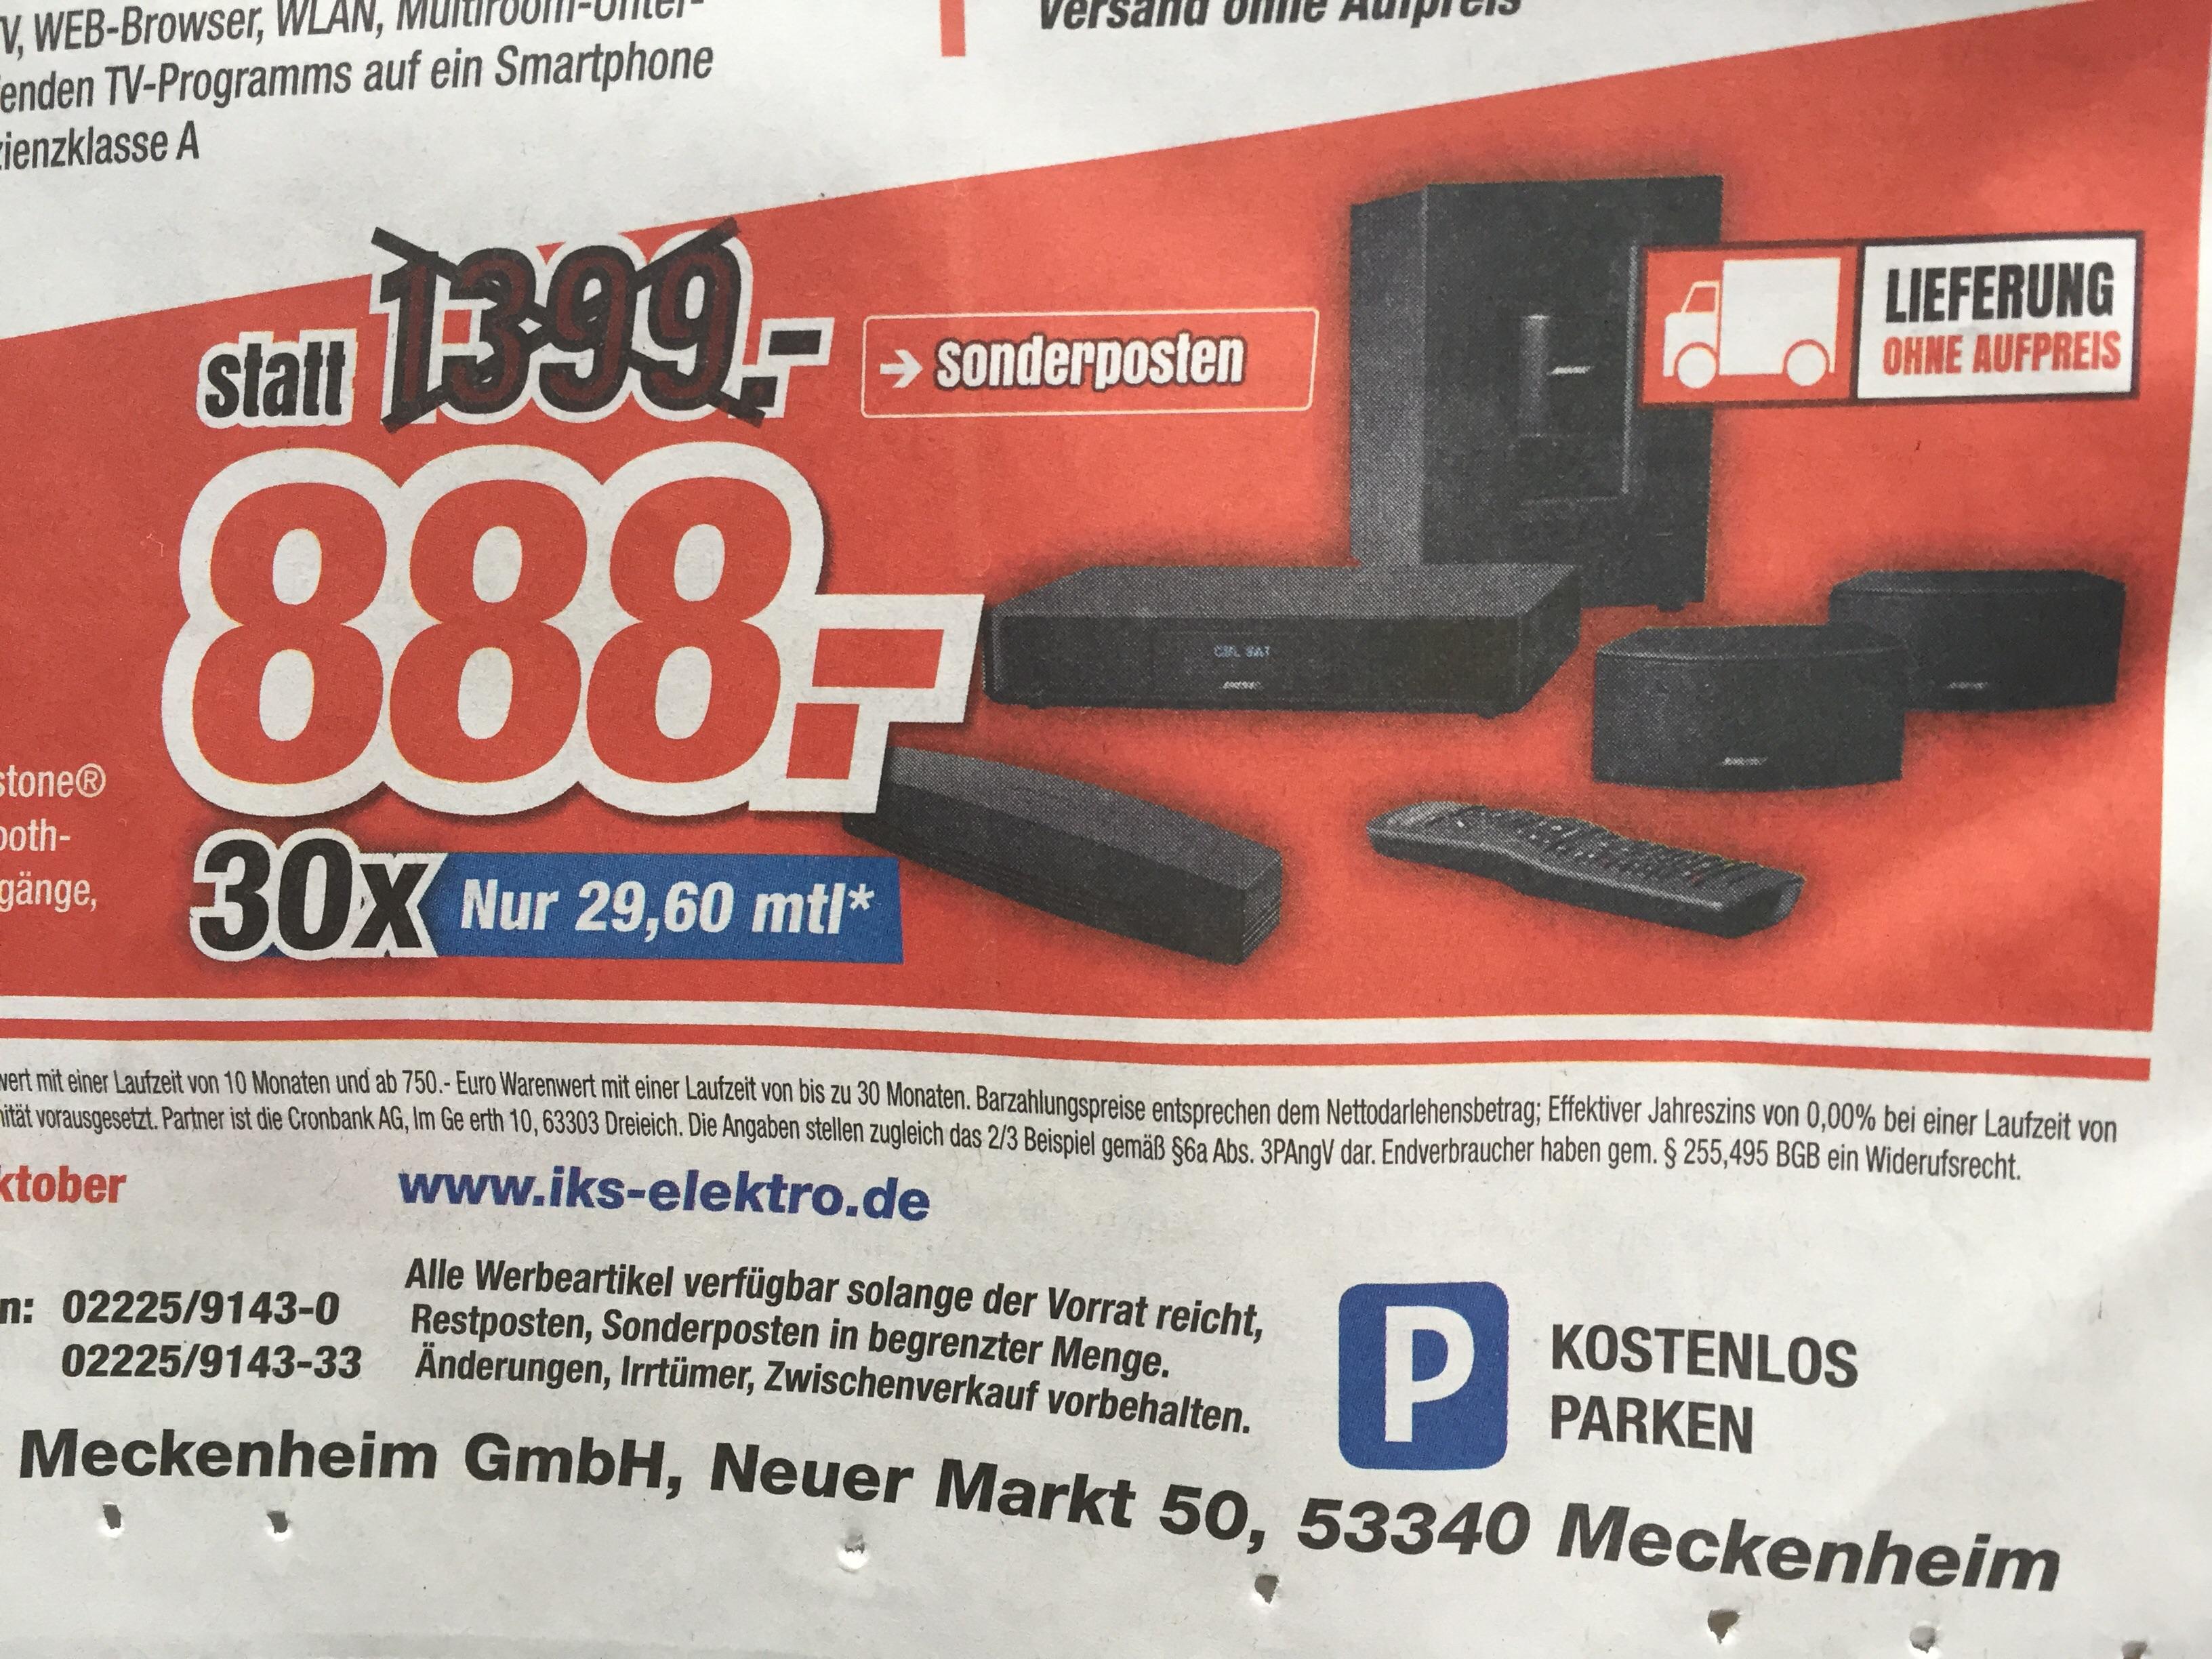 Lokal/Nähe Bonn - Nur 888,- € (idealo 1.149,-) Bose 2.1 Heimkinosystem Soundtouch 220